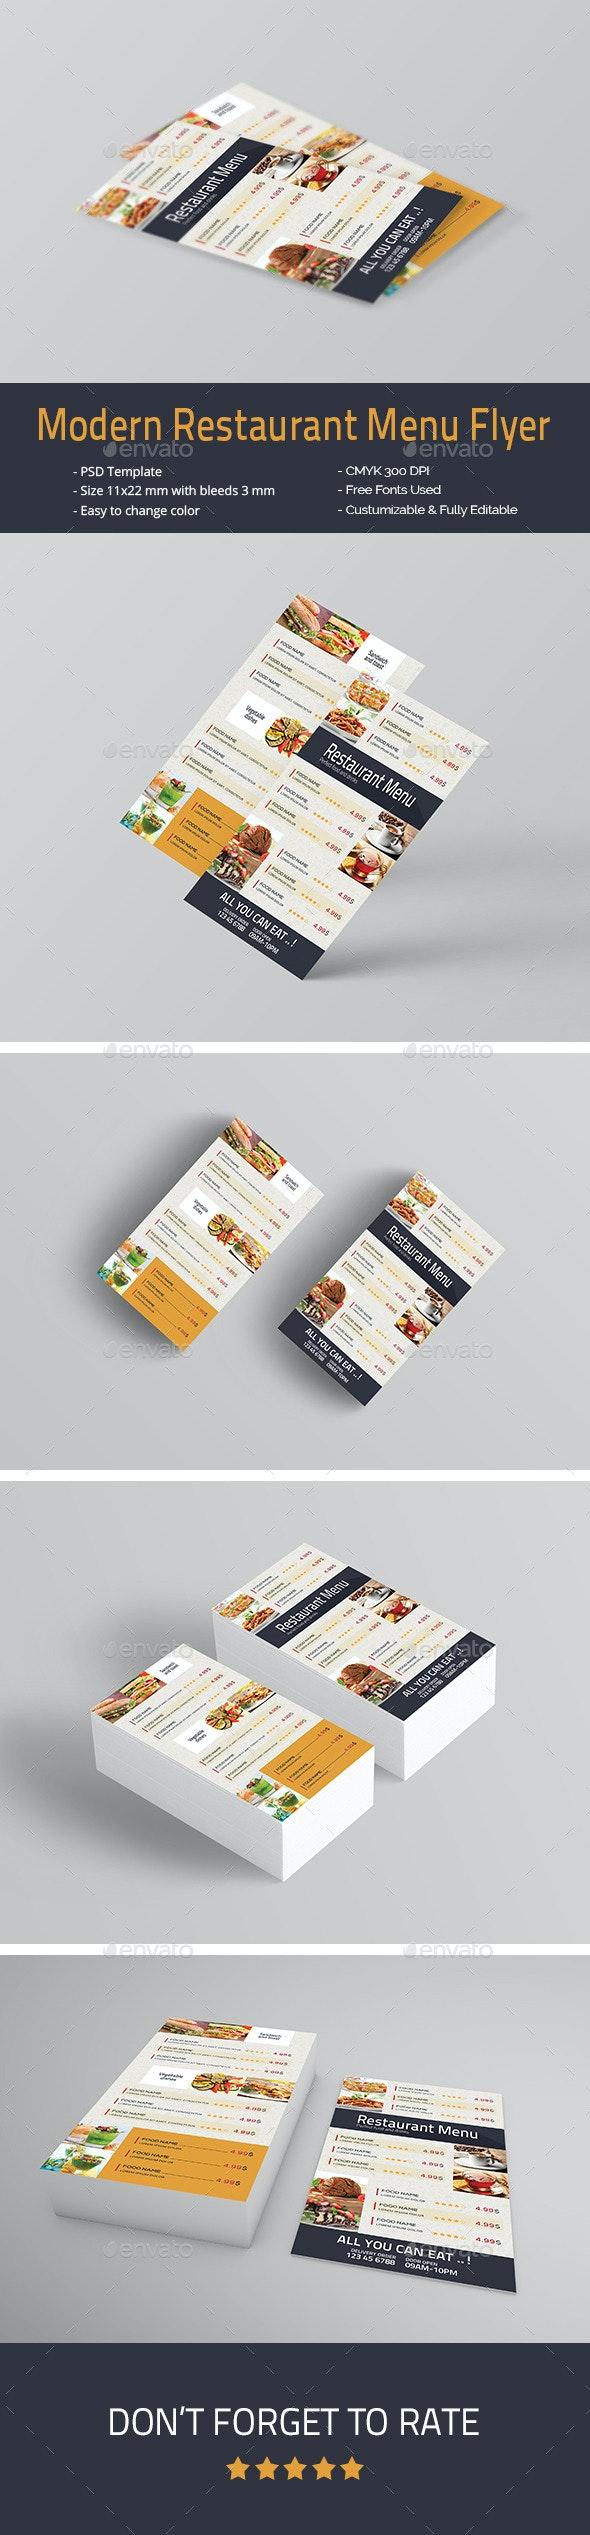 Modern Restaurant Menu Flyer - Food Menus Print Templates